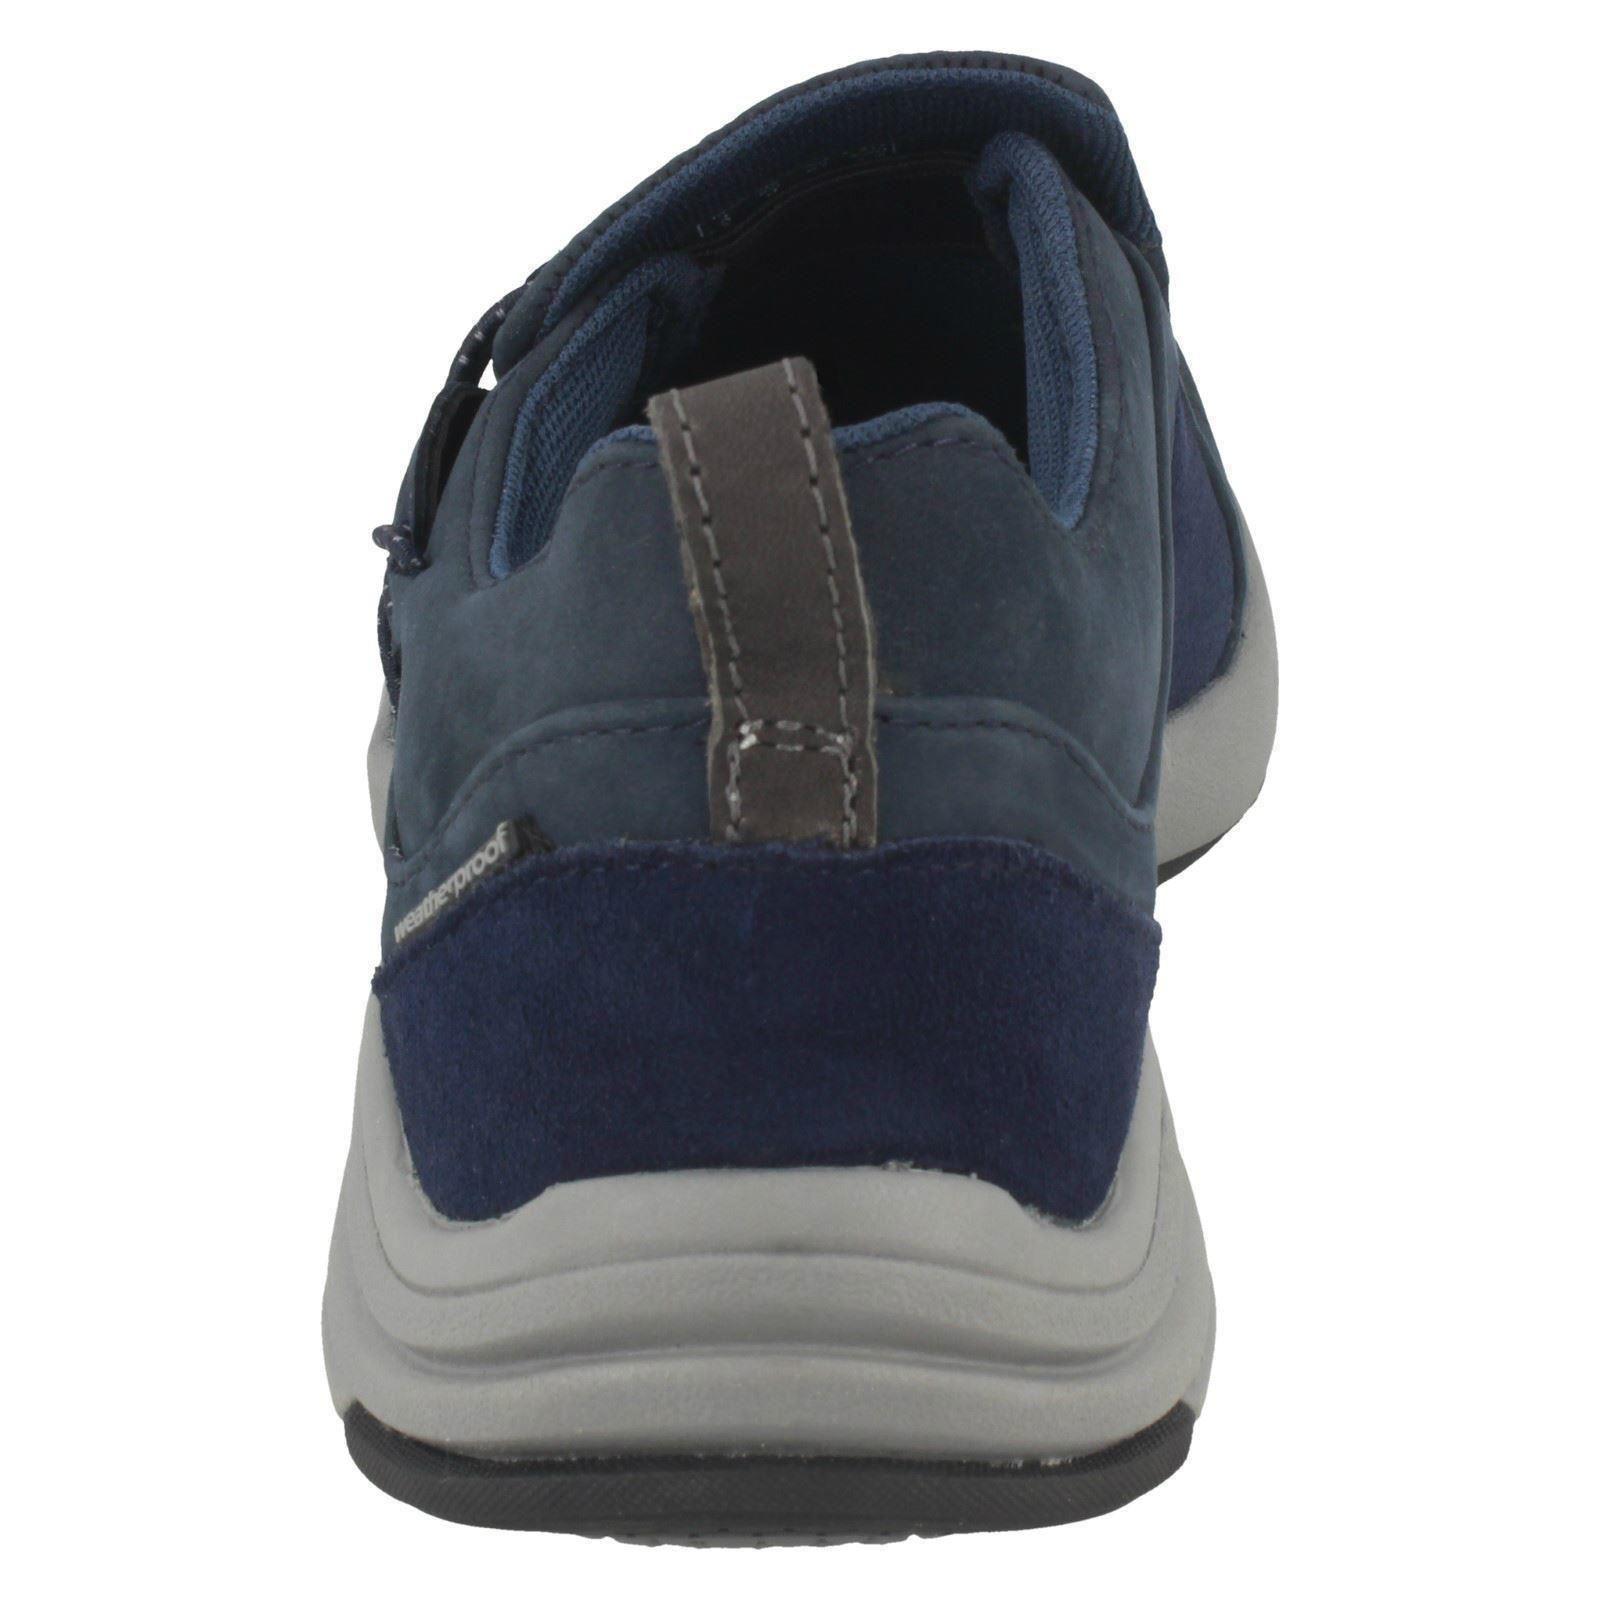 Clarks Zapatos-Wave Damas Informal Zapatos-Wave Clarks River a46318